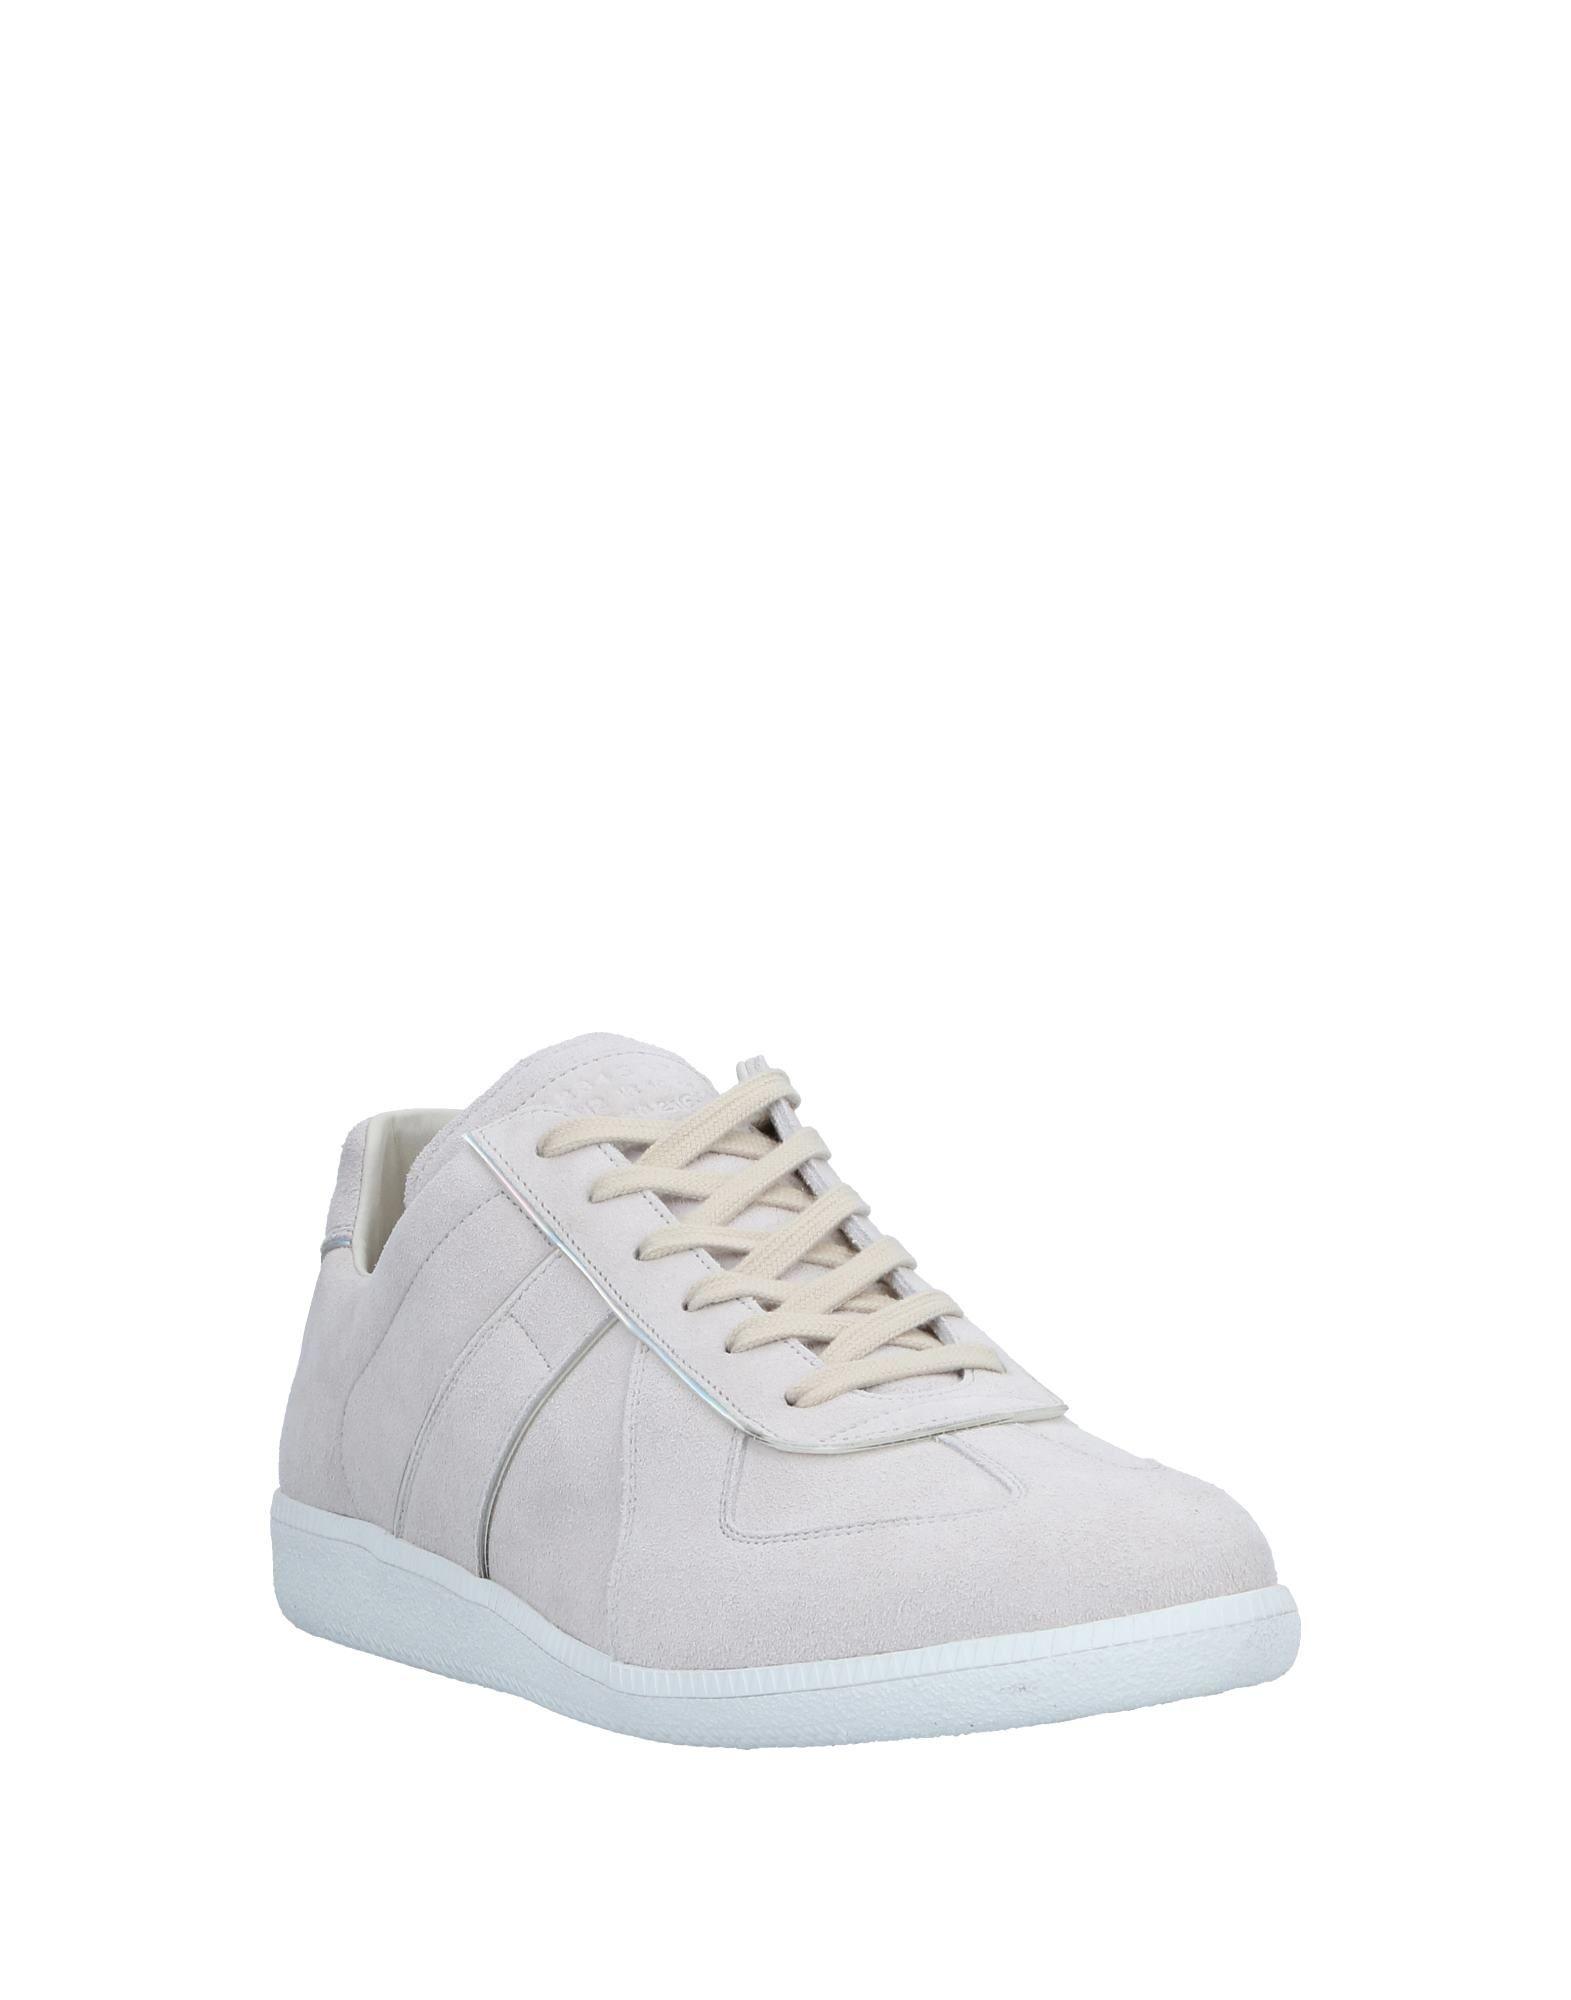 Sneakers Maison Margiela Uomo - 11204553JK